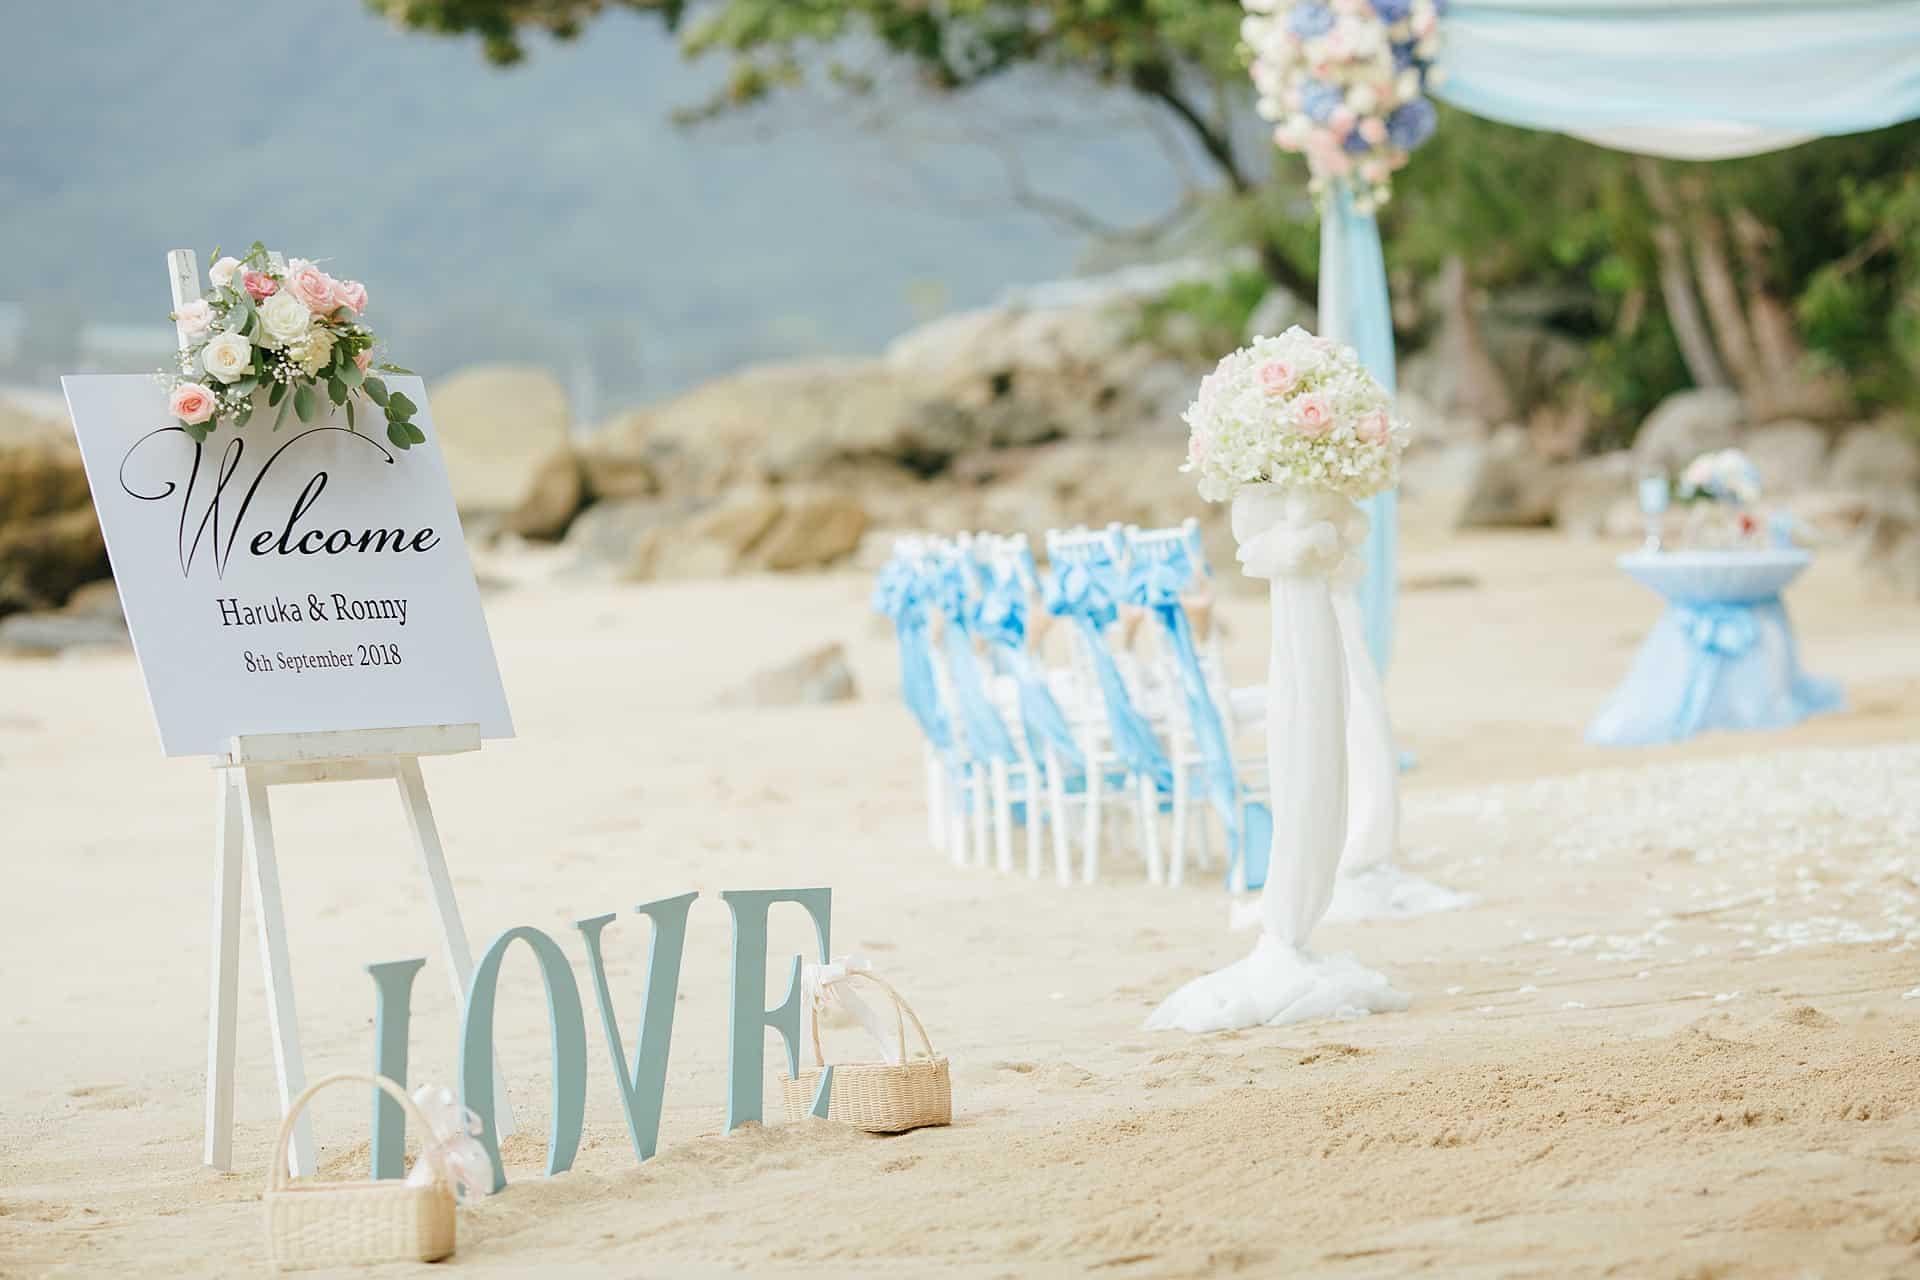 Wedding Haruka & Ronny, Hua Beach 8th September 2018 234